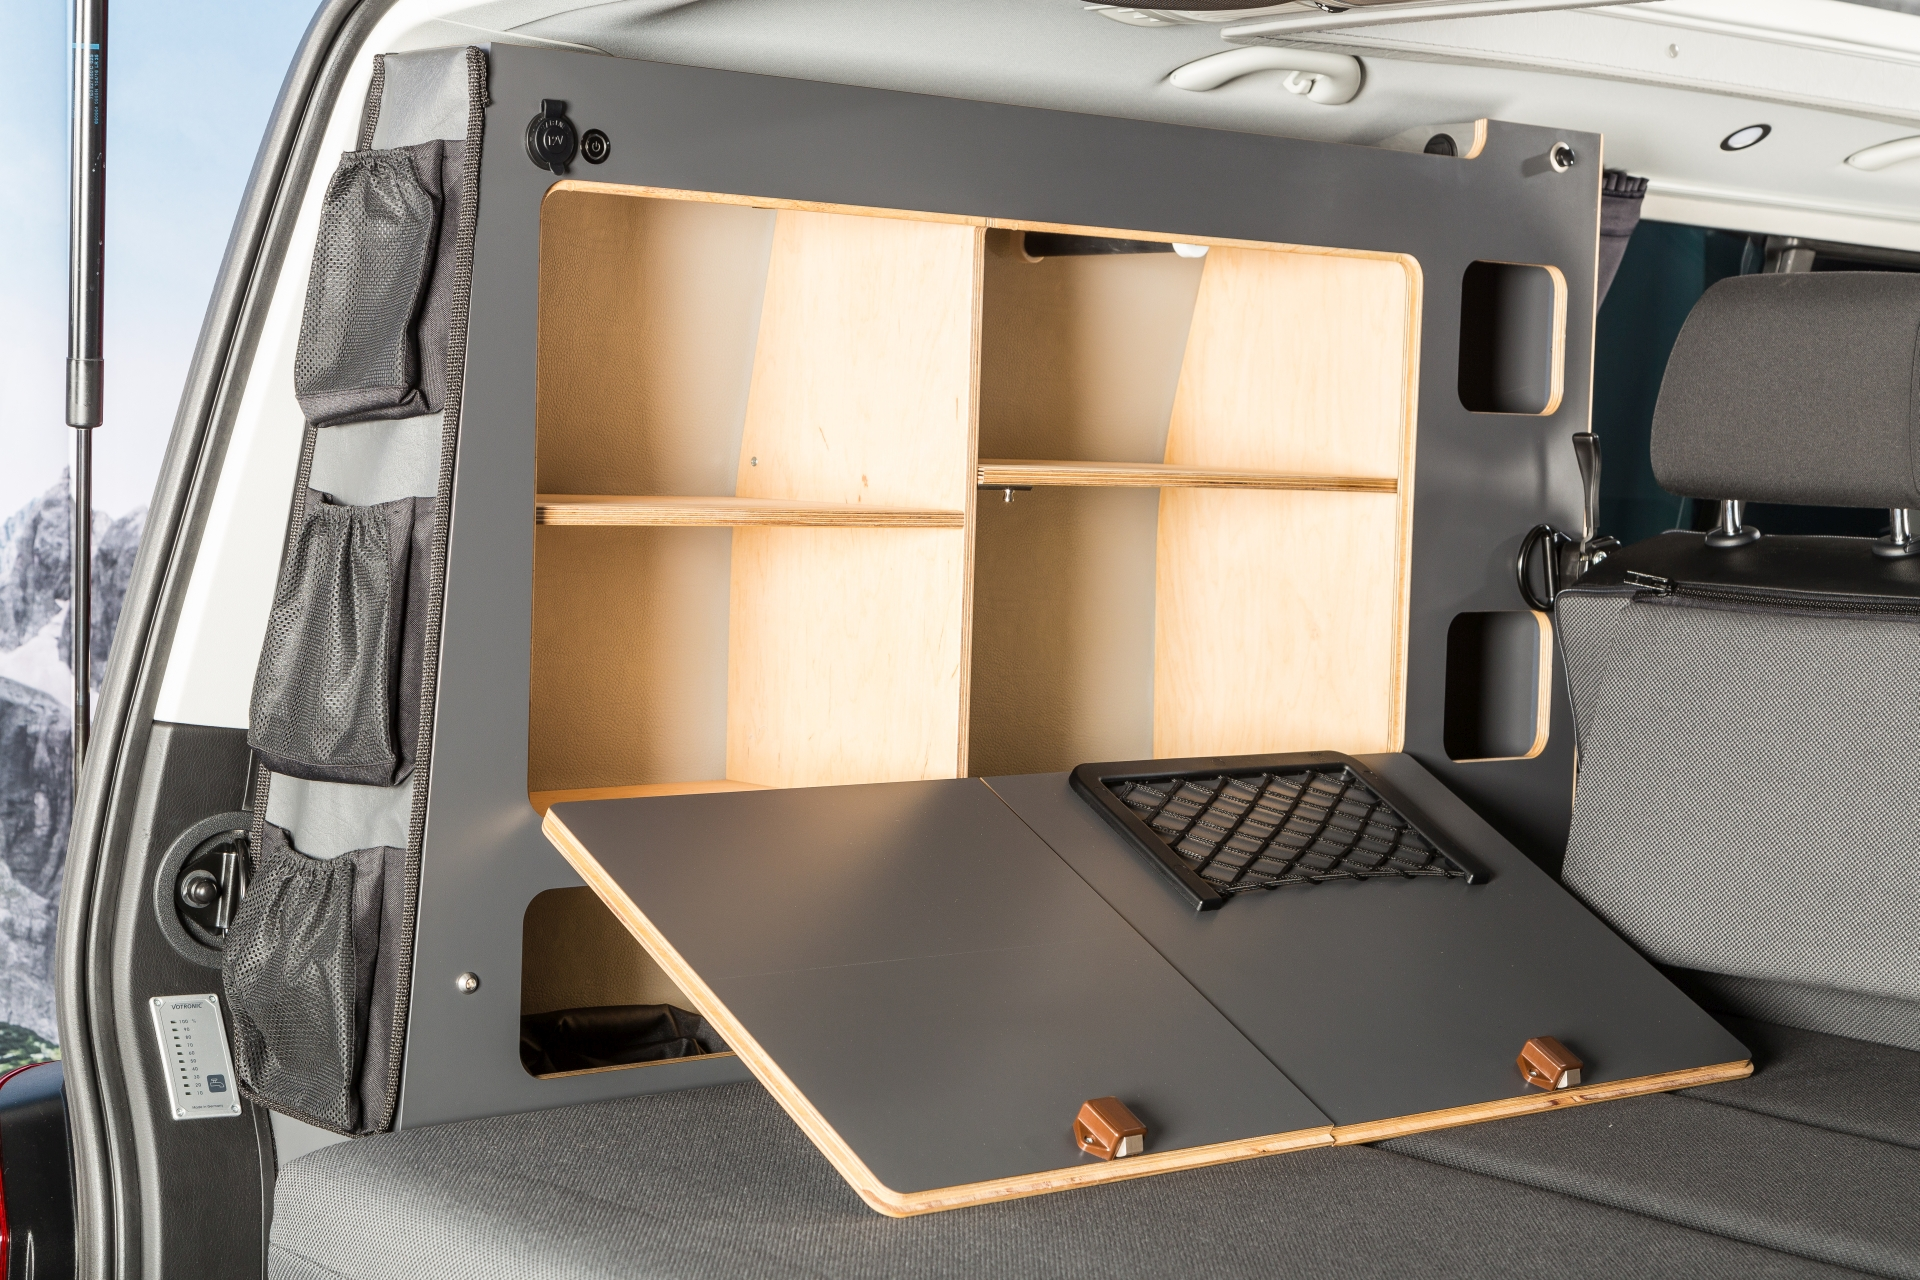 Camping Außenküche Selber Bauen : Vw bus: vw t6 campingbus kaufen · vw bus spacecamper vw t6